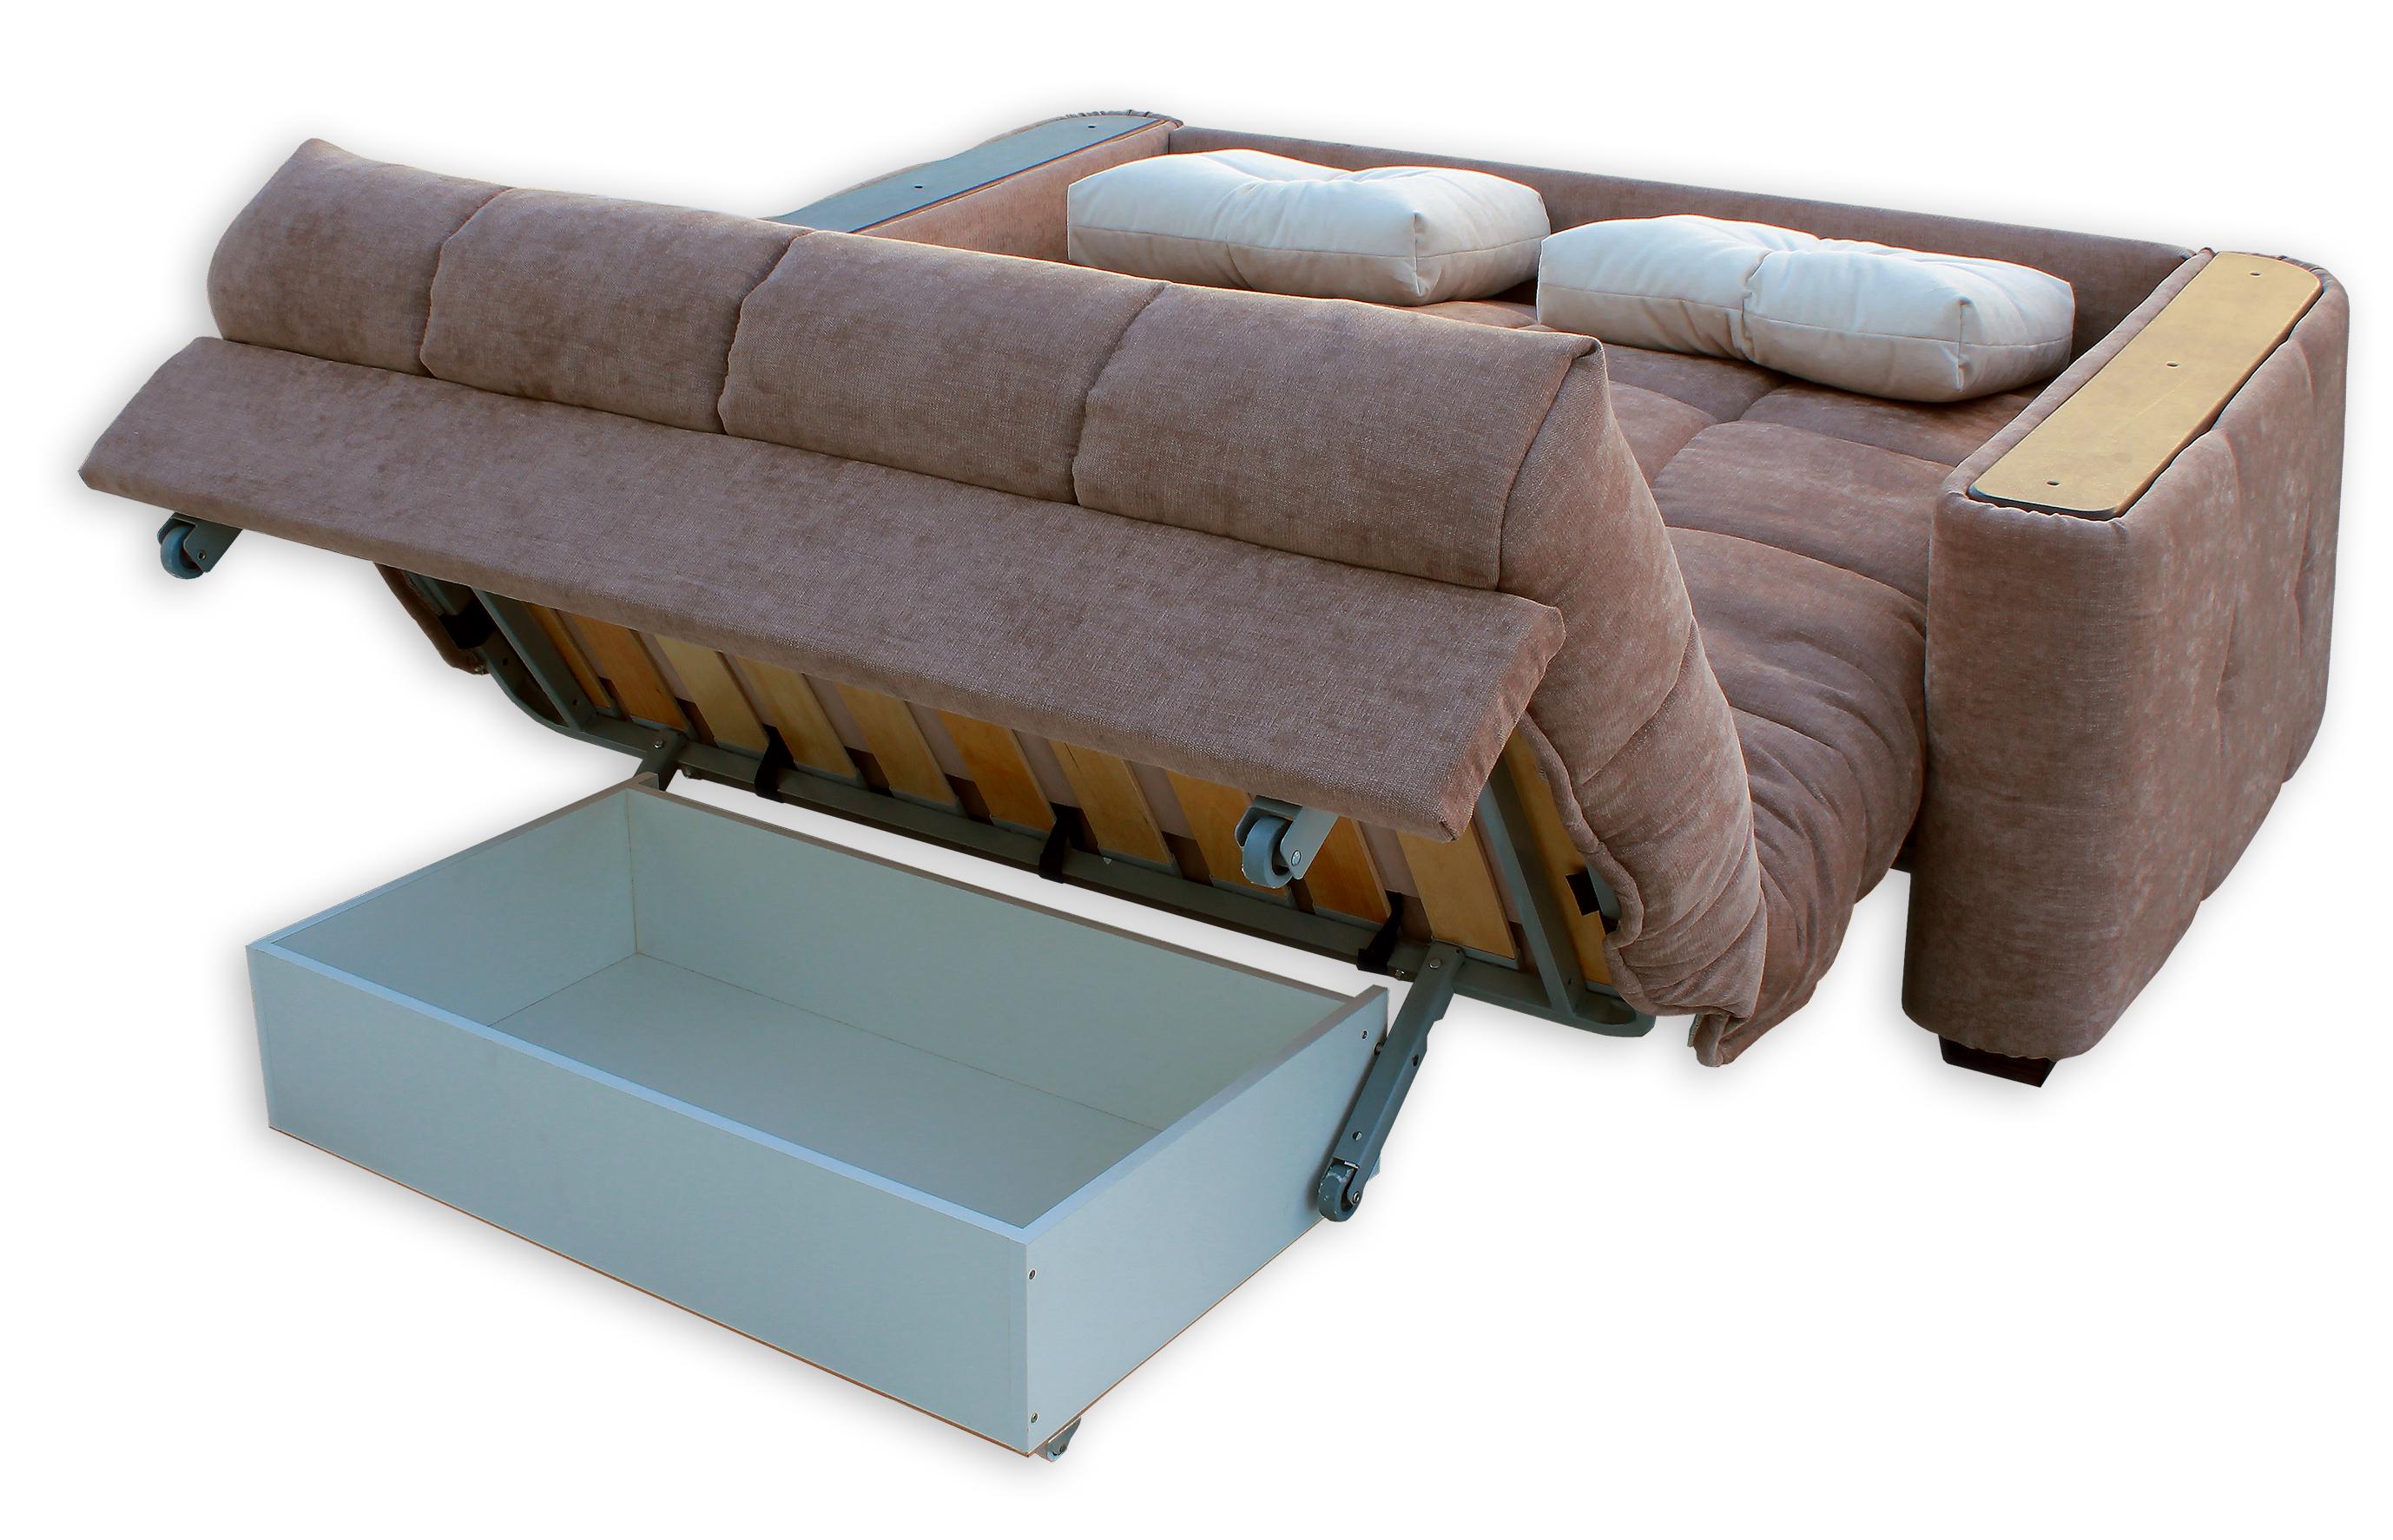 боковинки к дивану чертеж и схема